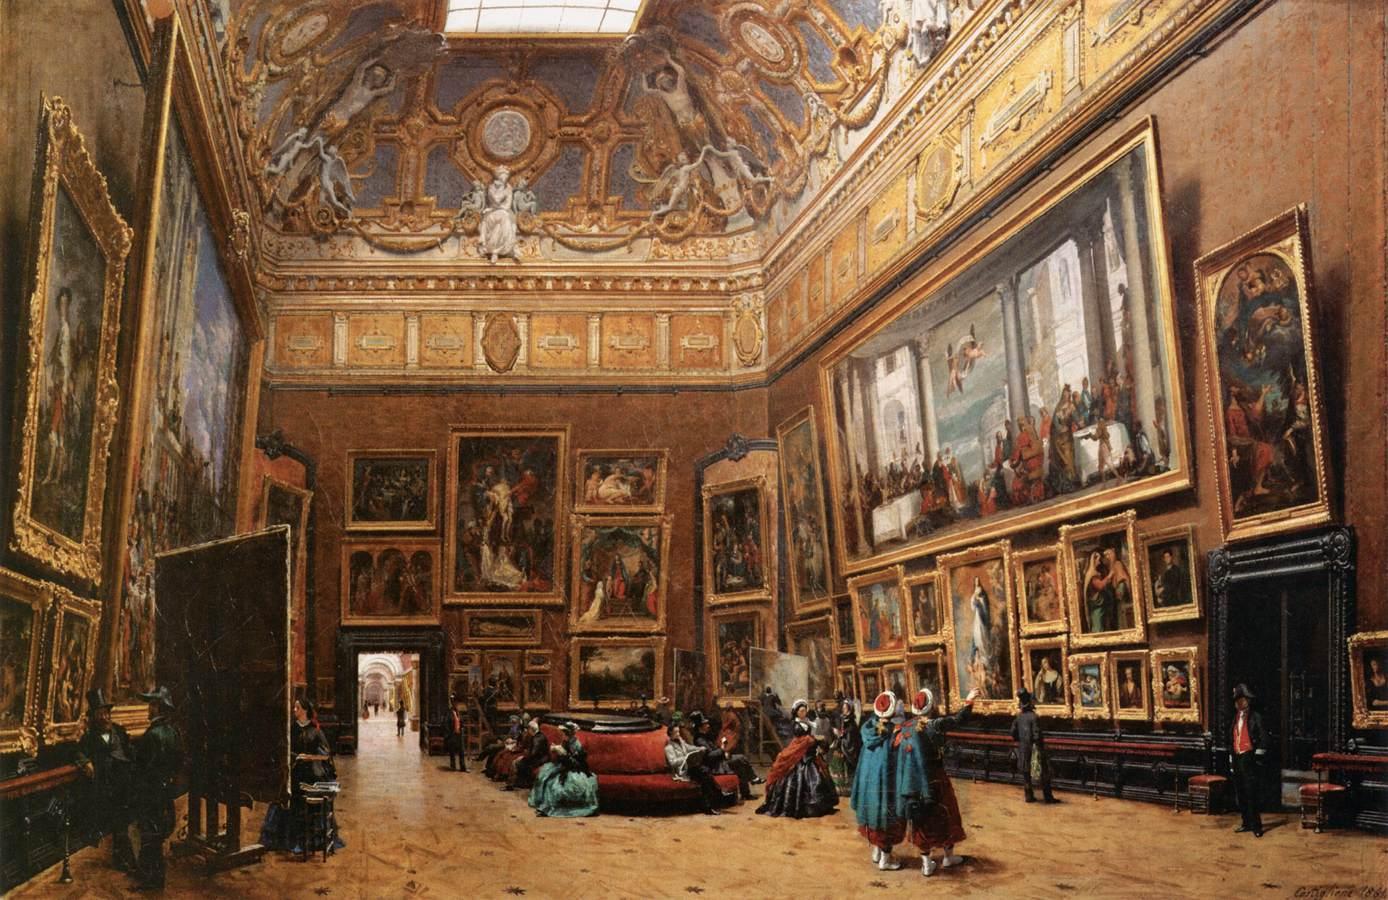 Giuseppe Castiglione, View of the Grand Salon Carré in the Louvre , 1861. Louvre, Paris.